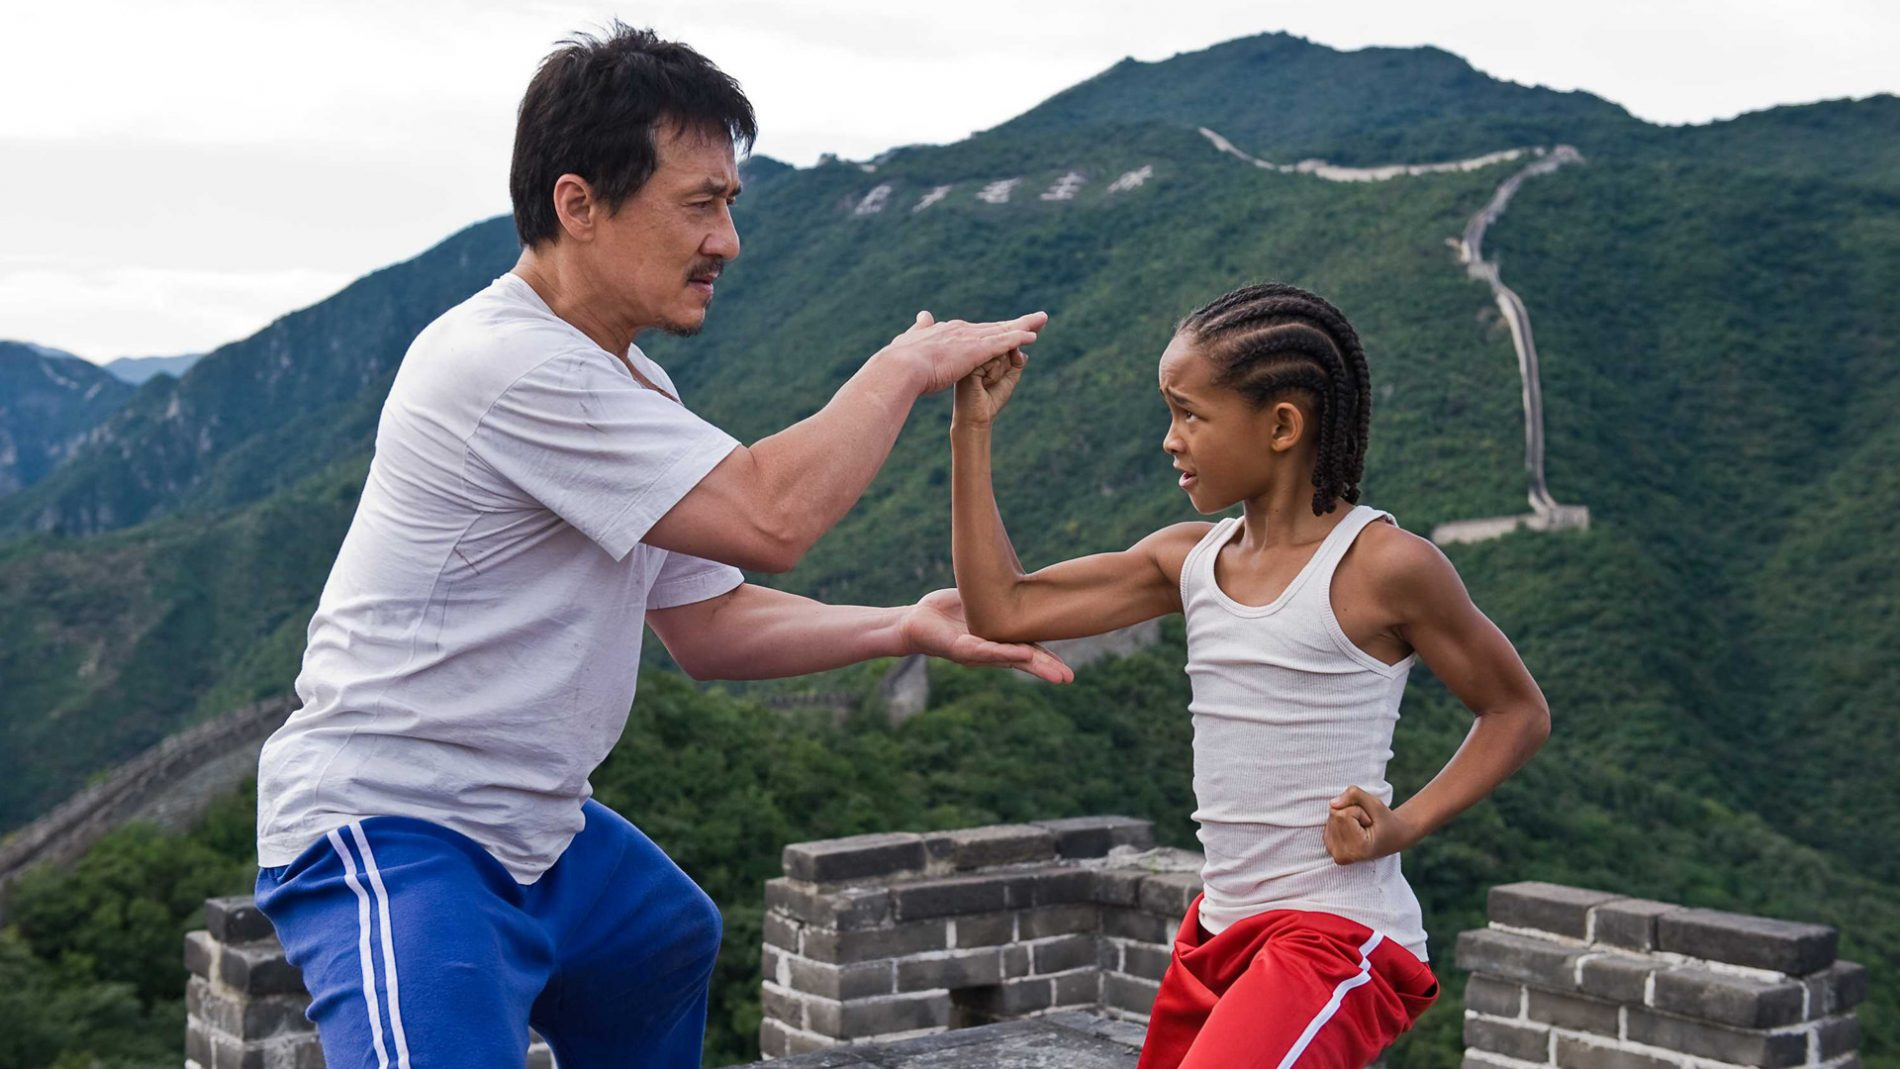 tai chi: karate kid